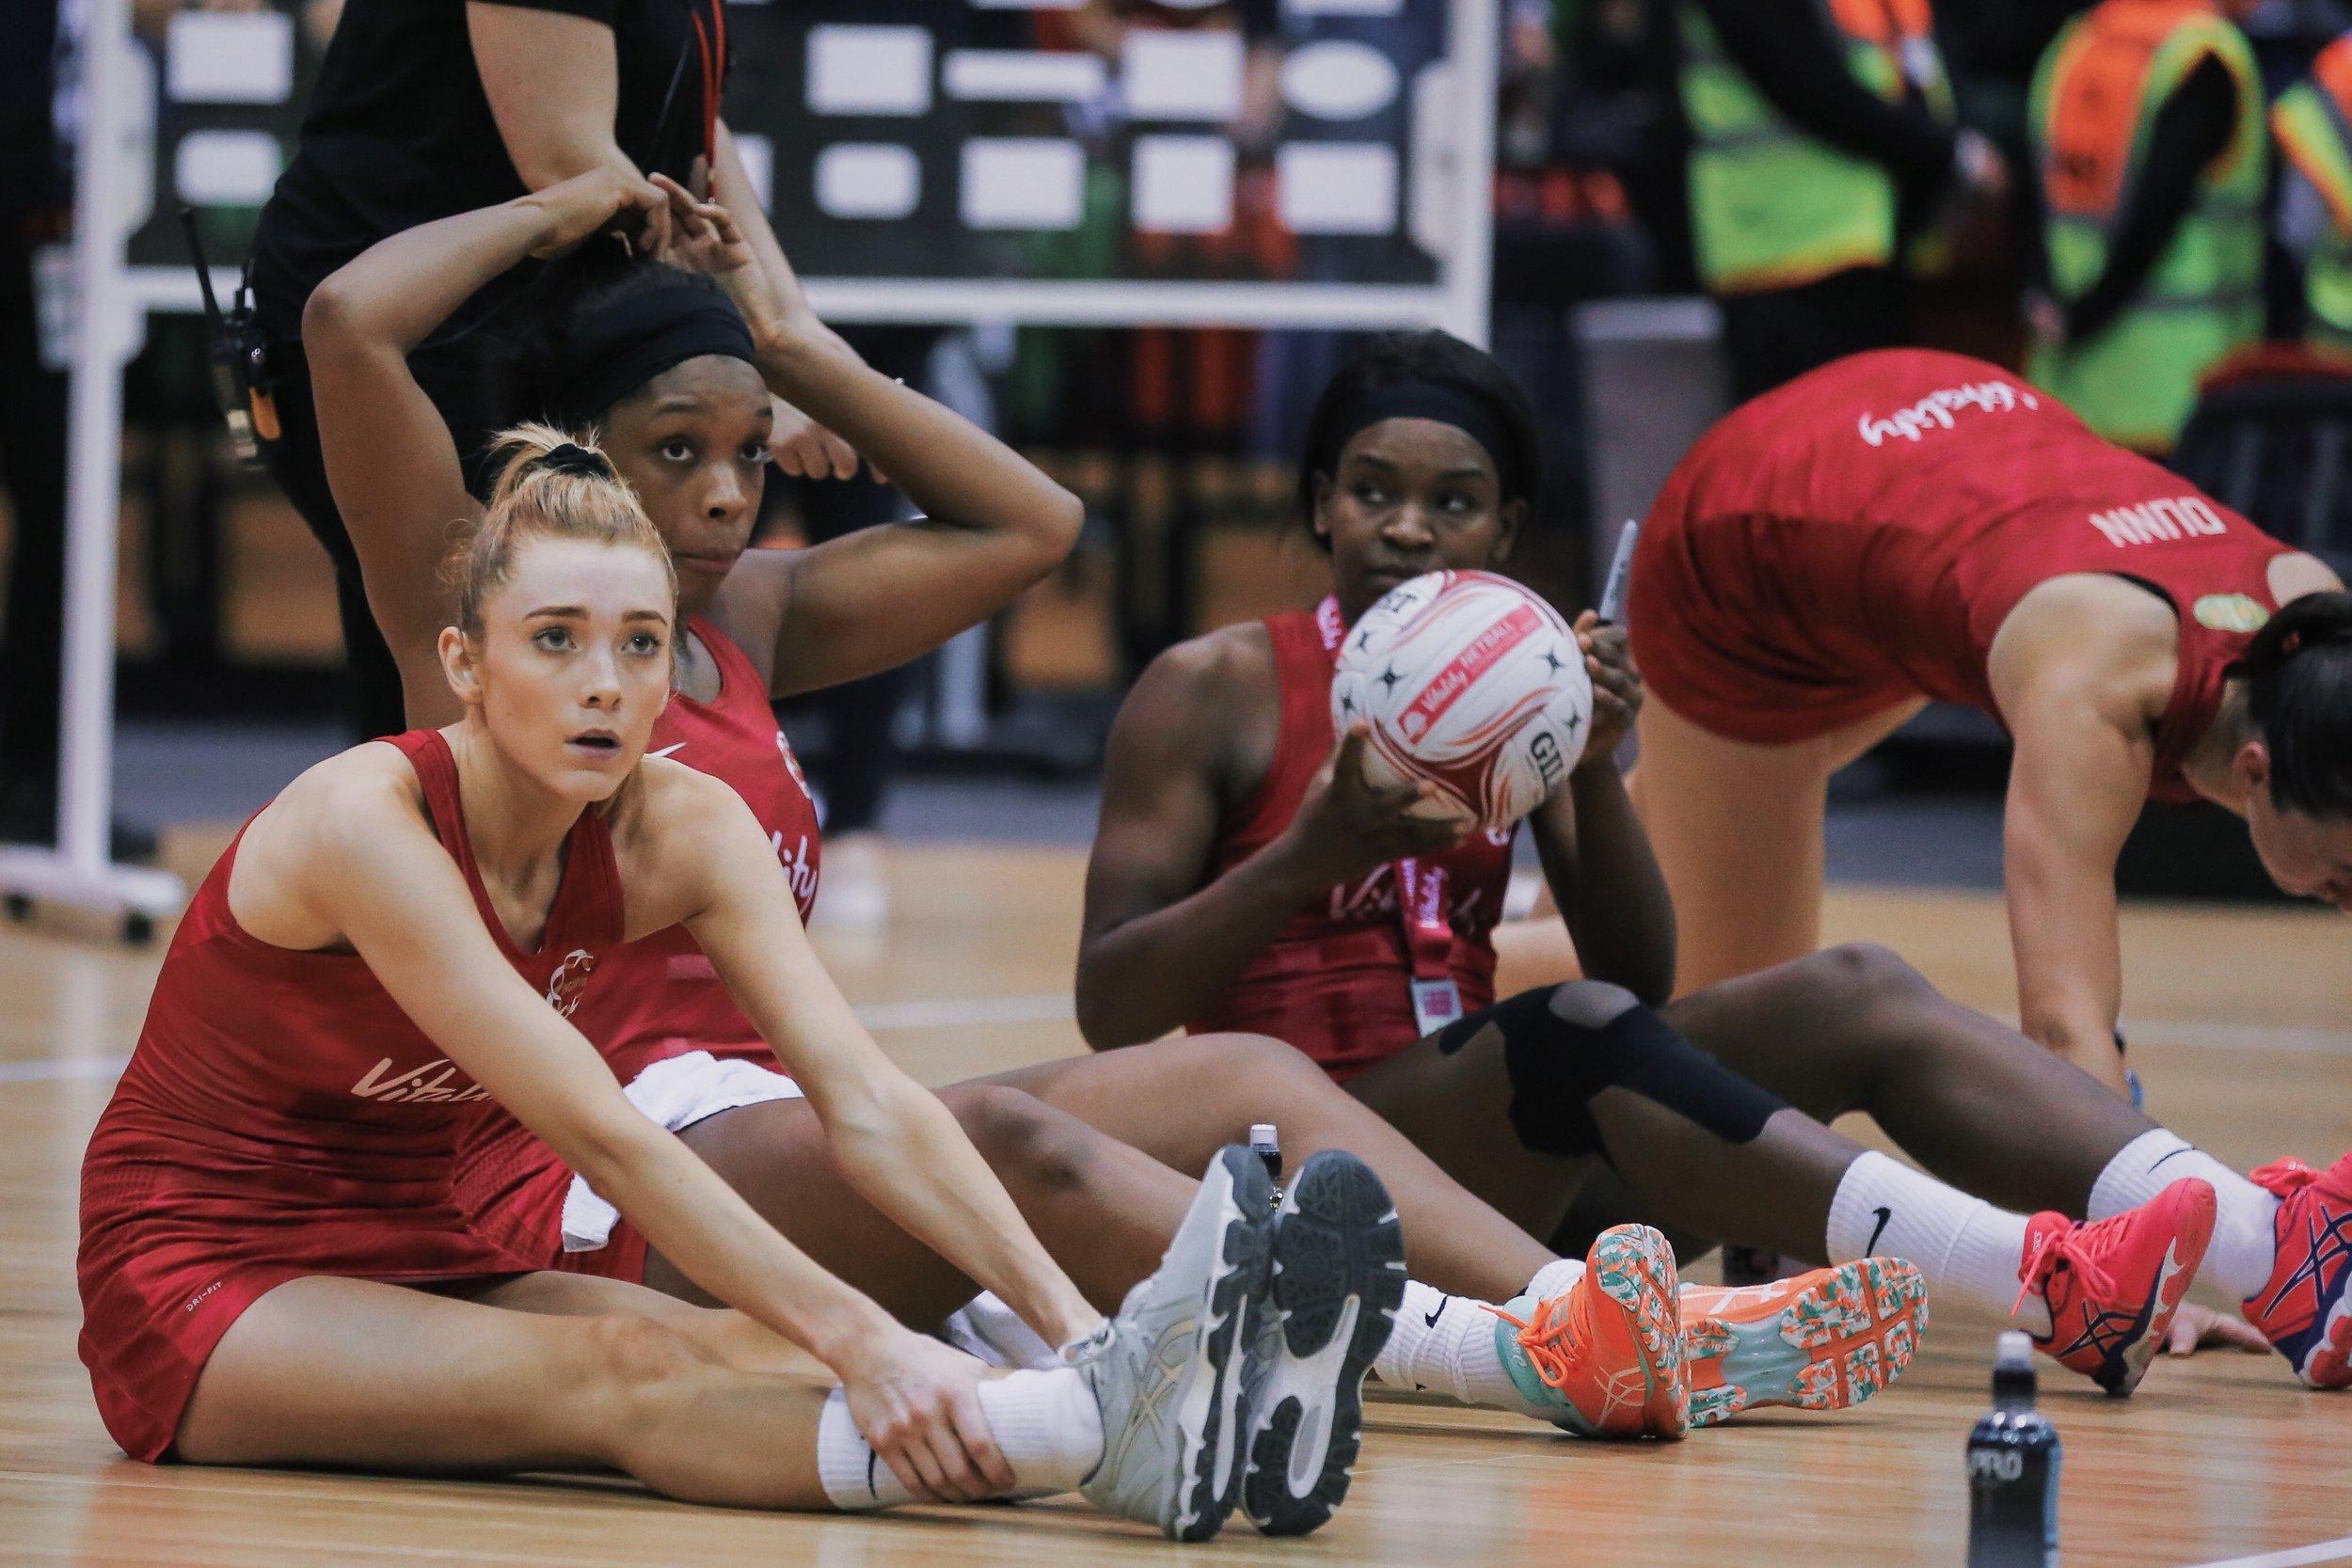 womens-netball-sport-england-uganda-international-series-30.jpg